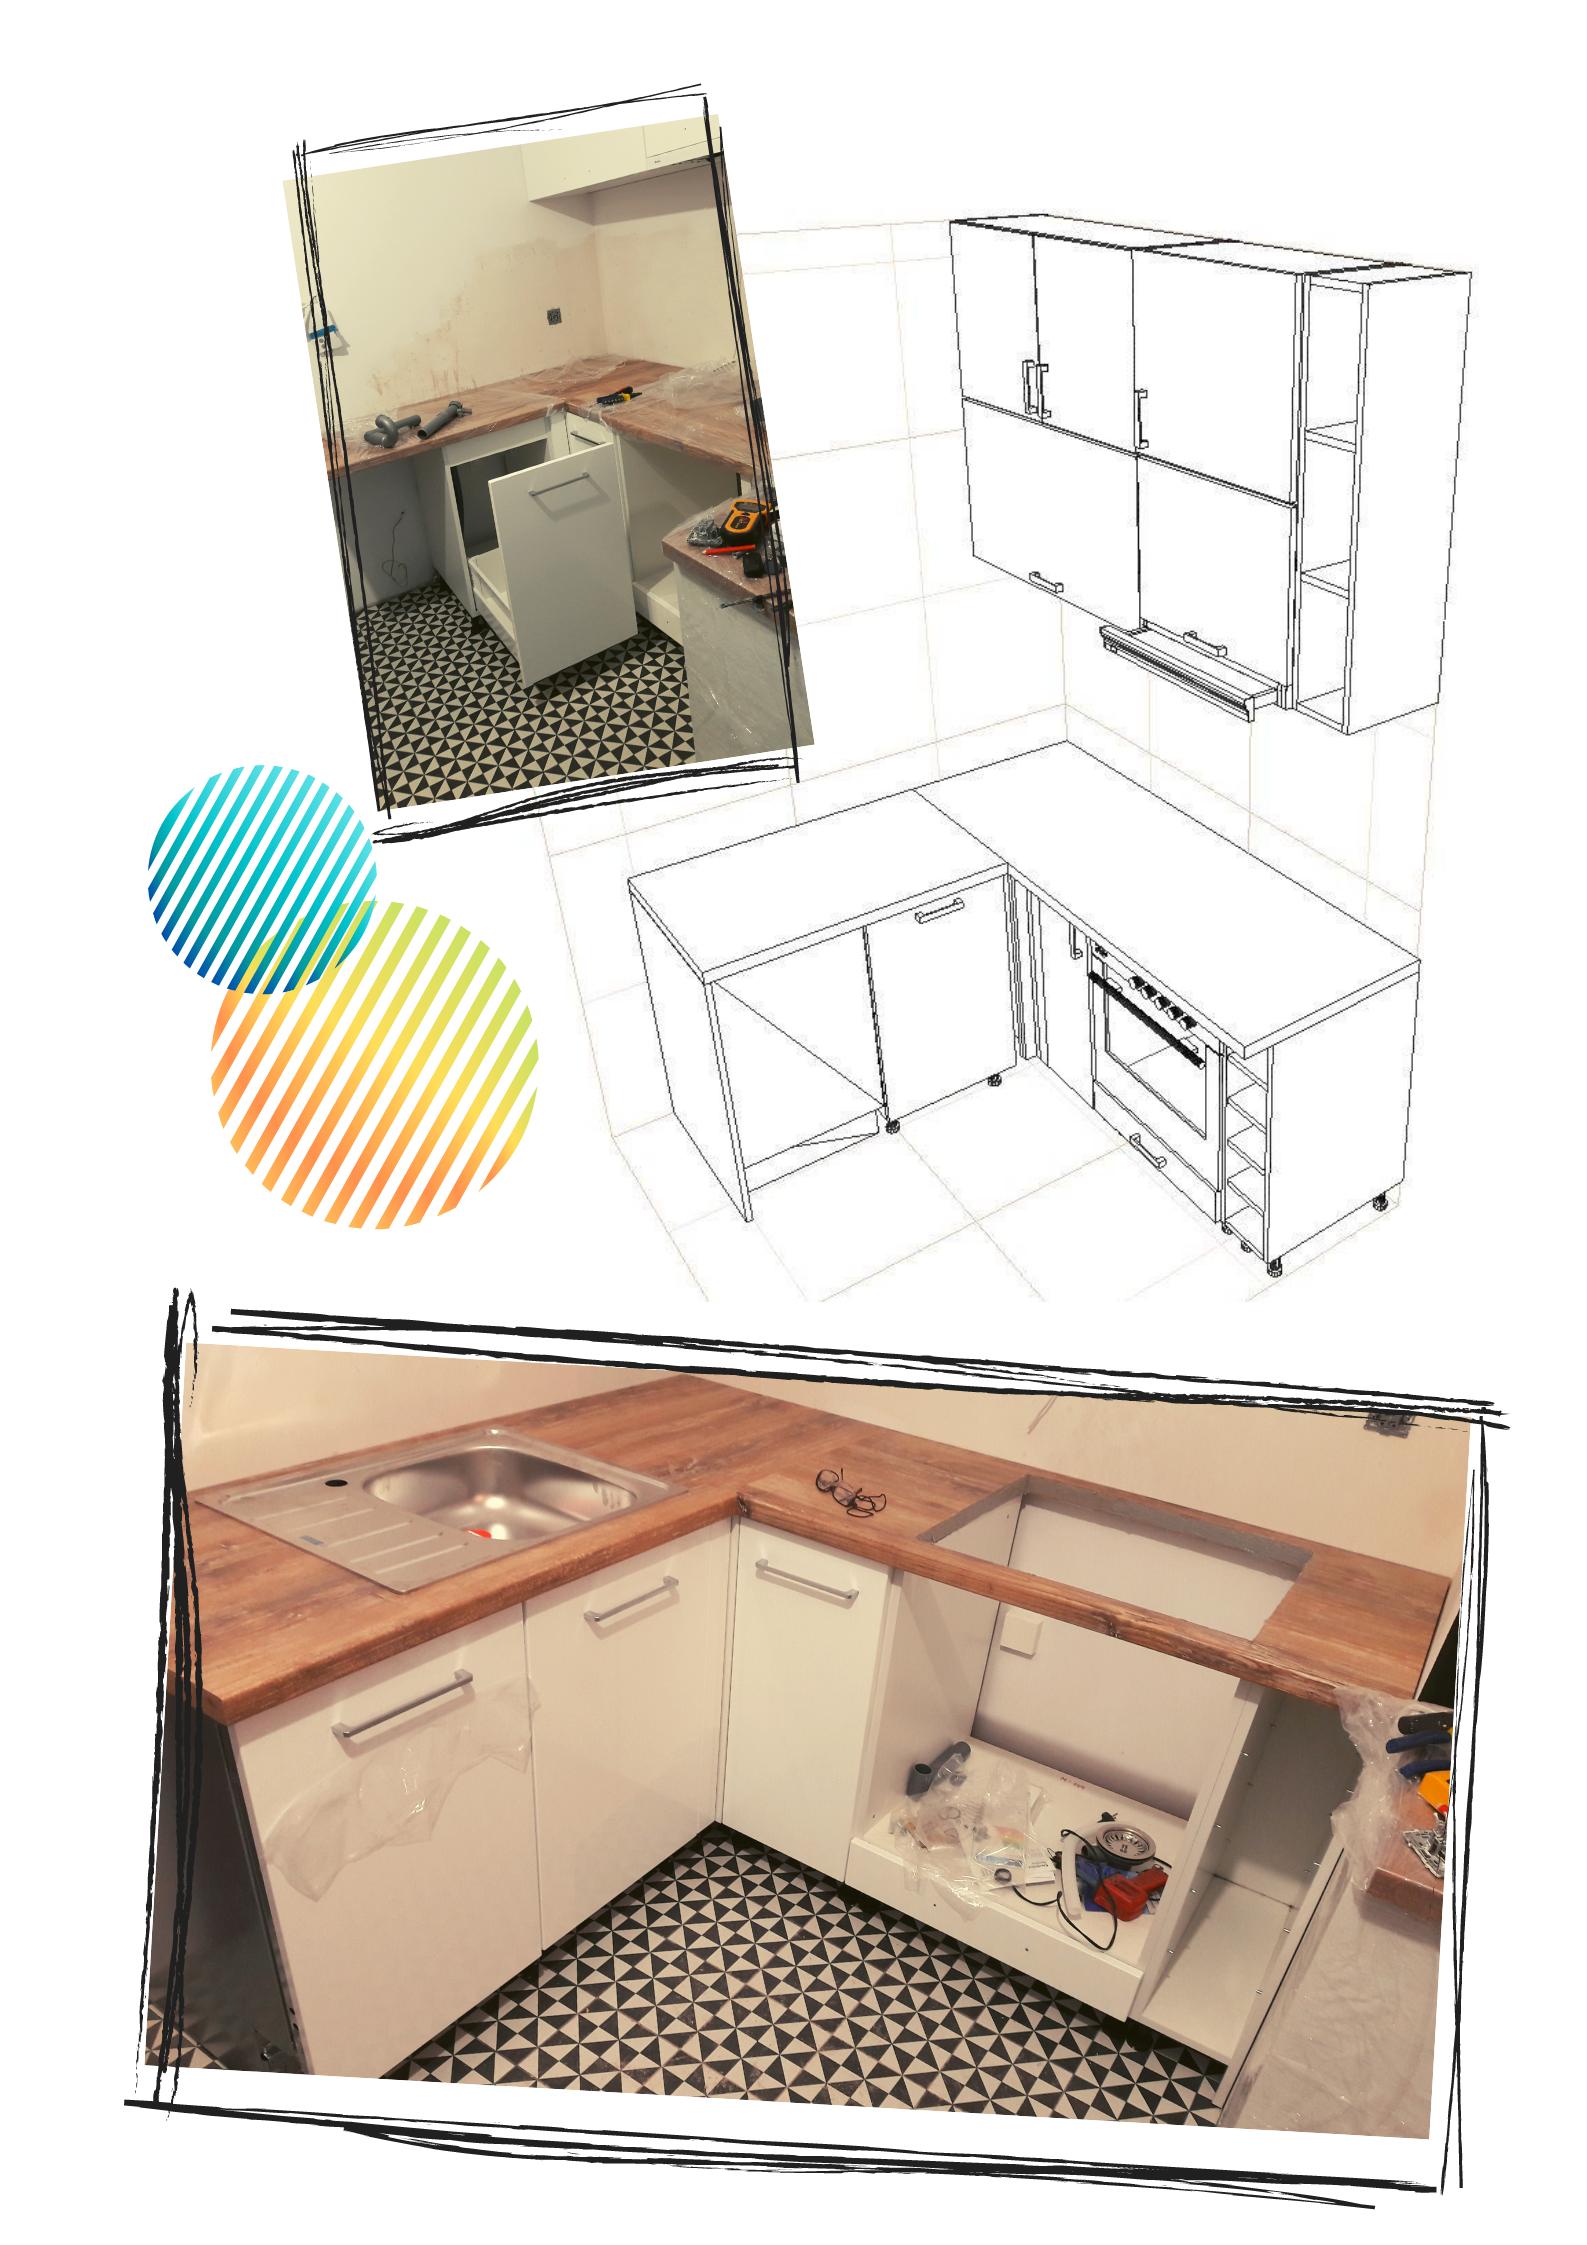 kup sobie chate blog rysunek mebli meble w trakcie skladania kuchnia